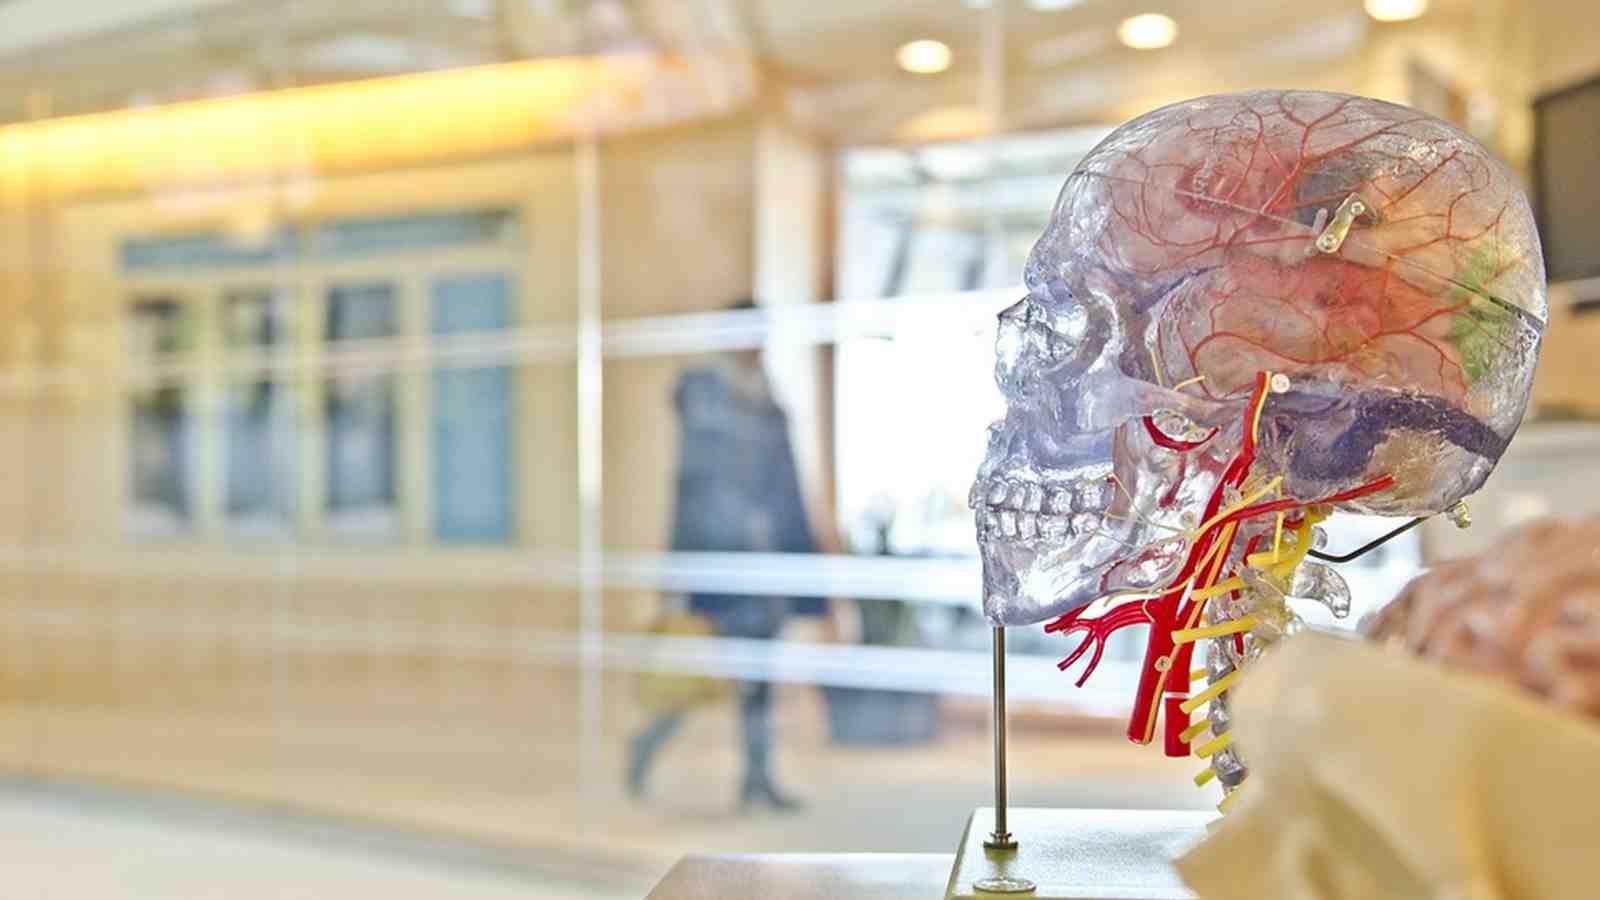 Plastic demo brain in an empty room.